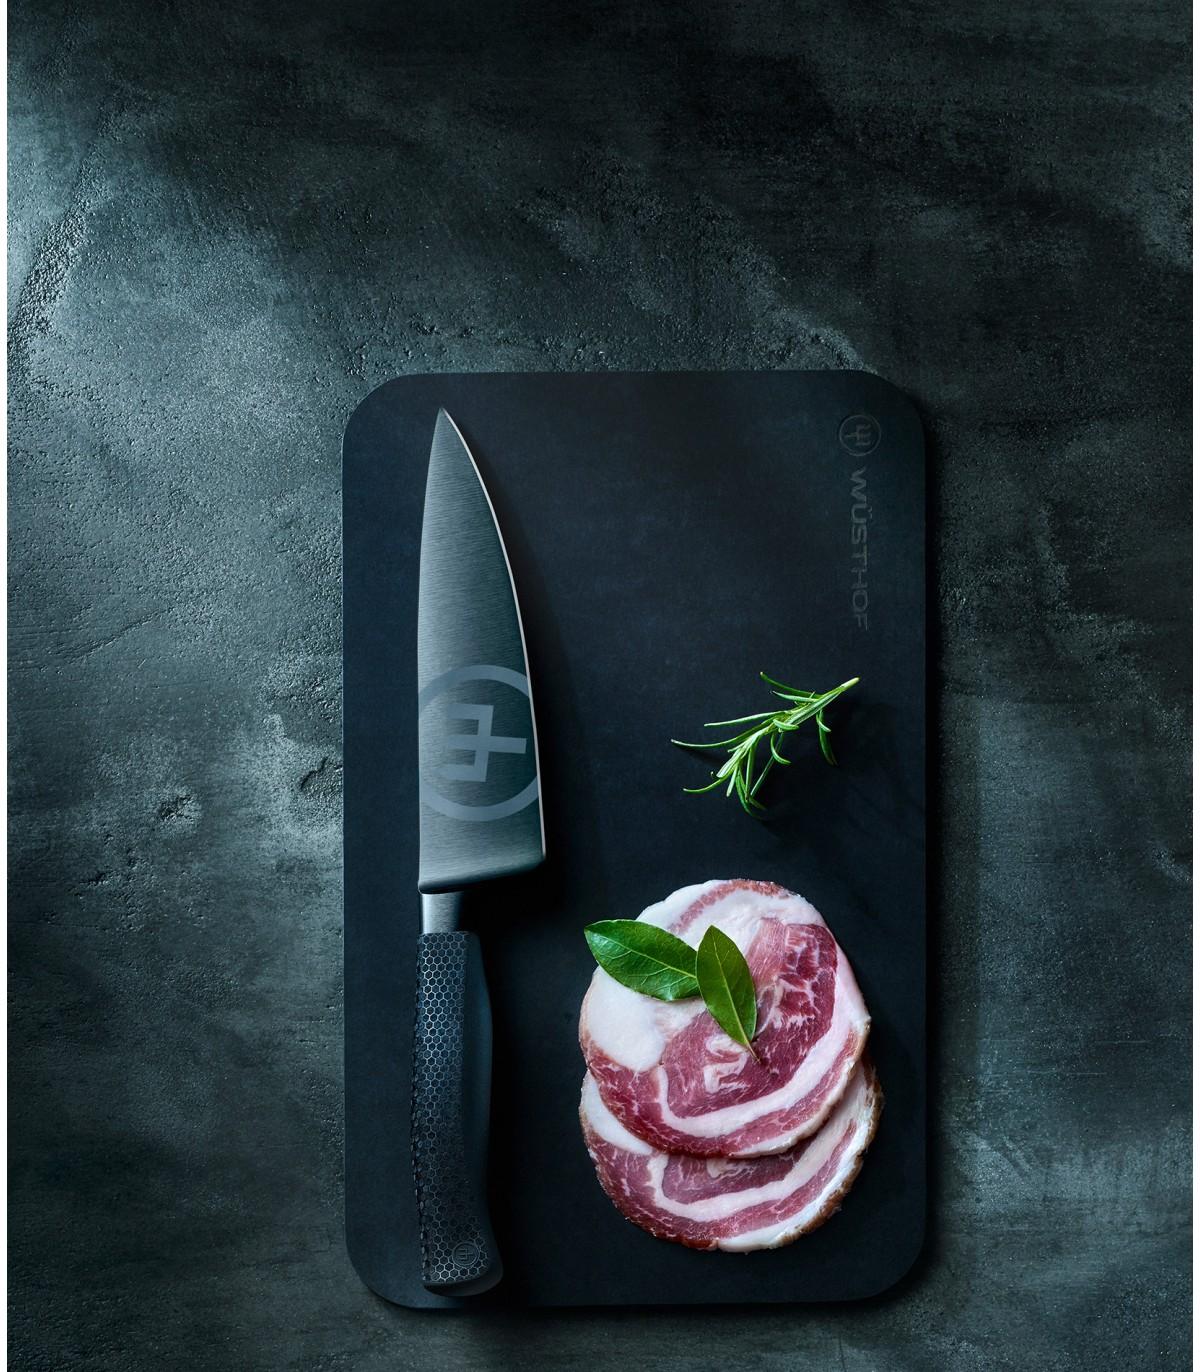 Wusthof Μαχαίρι Λαχανικών Σεφ 20 εκ. Performer